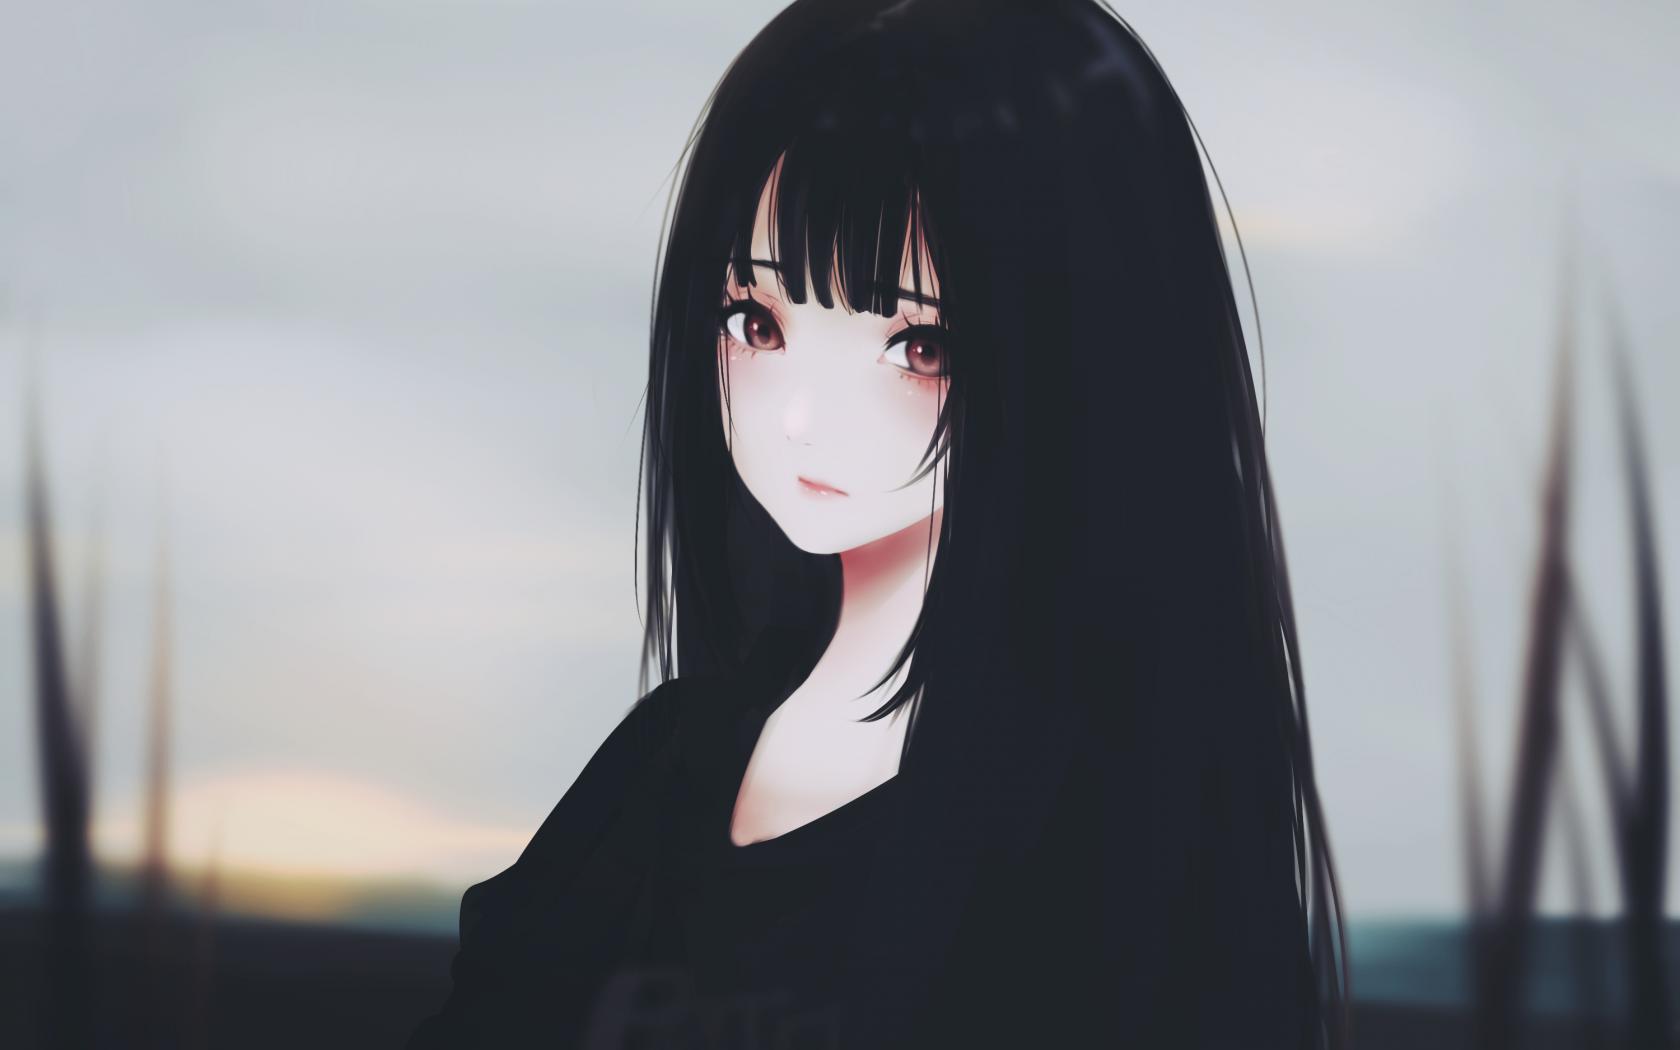 Anime Girl, Black Hair, Sad Expression, Semi Realistic - Aesthetic Sad Anime Girl - HD Wallpaper